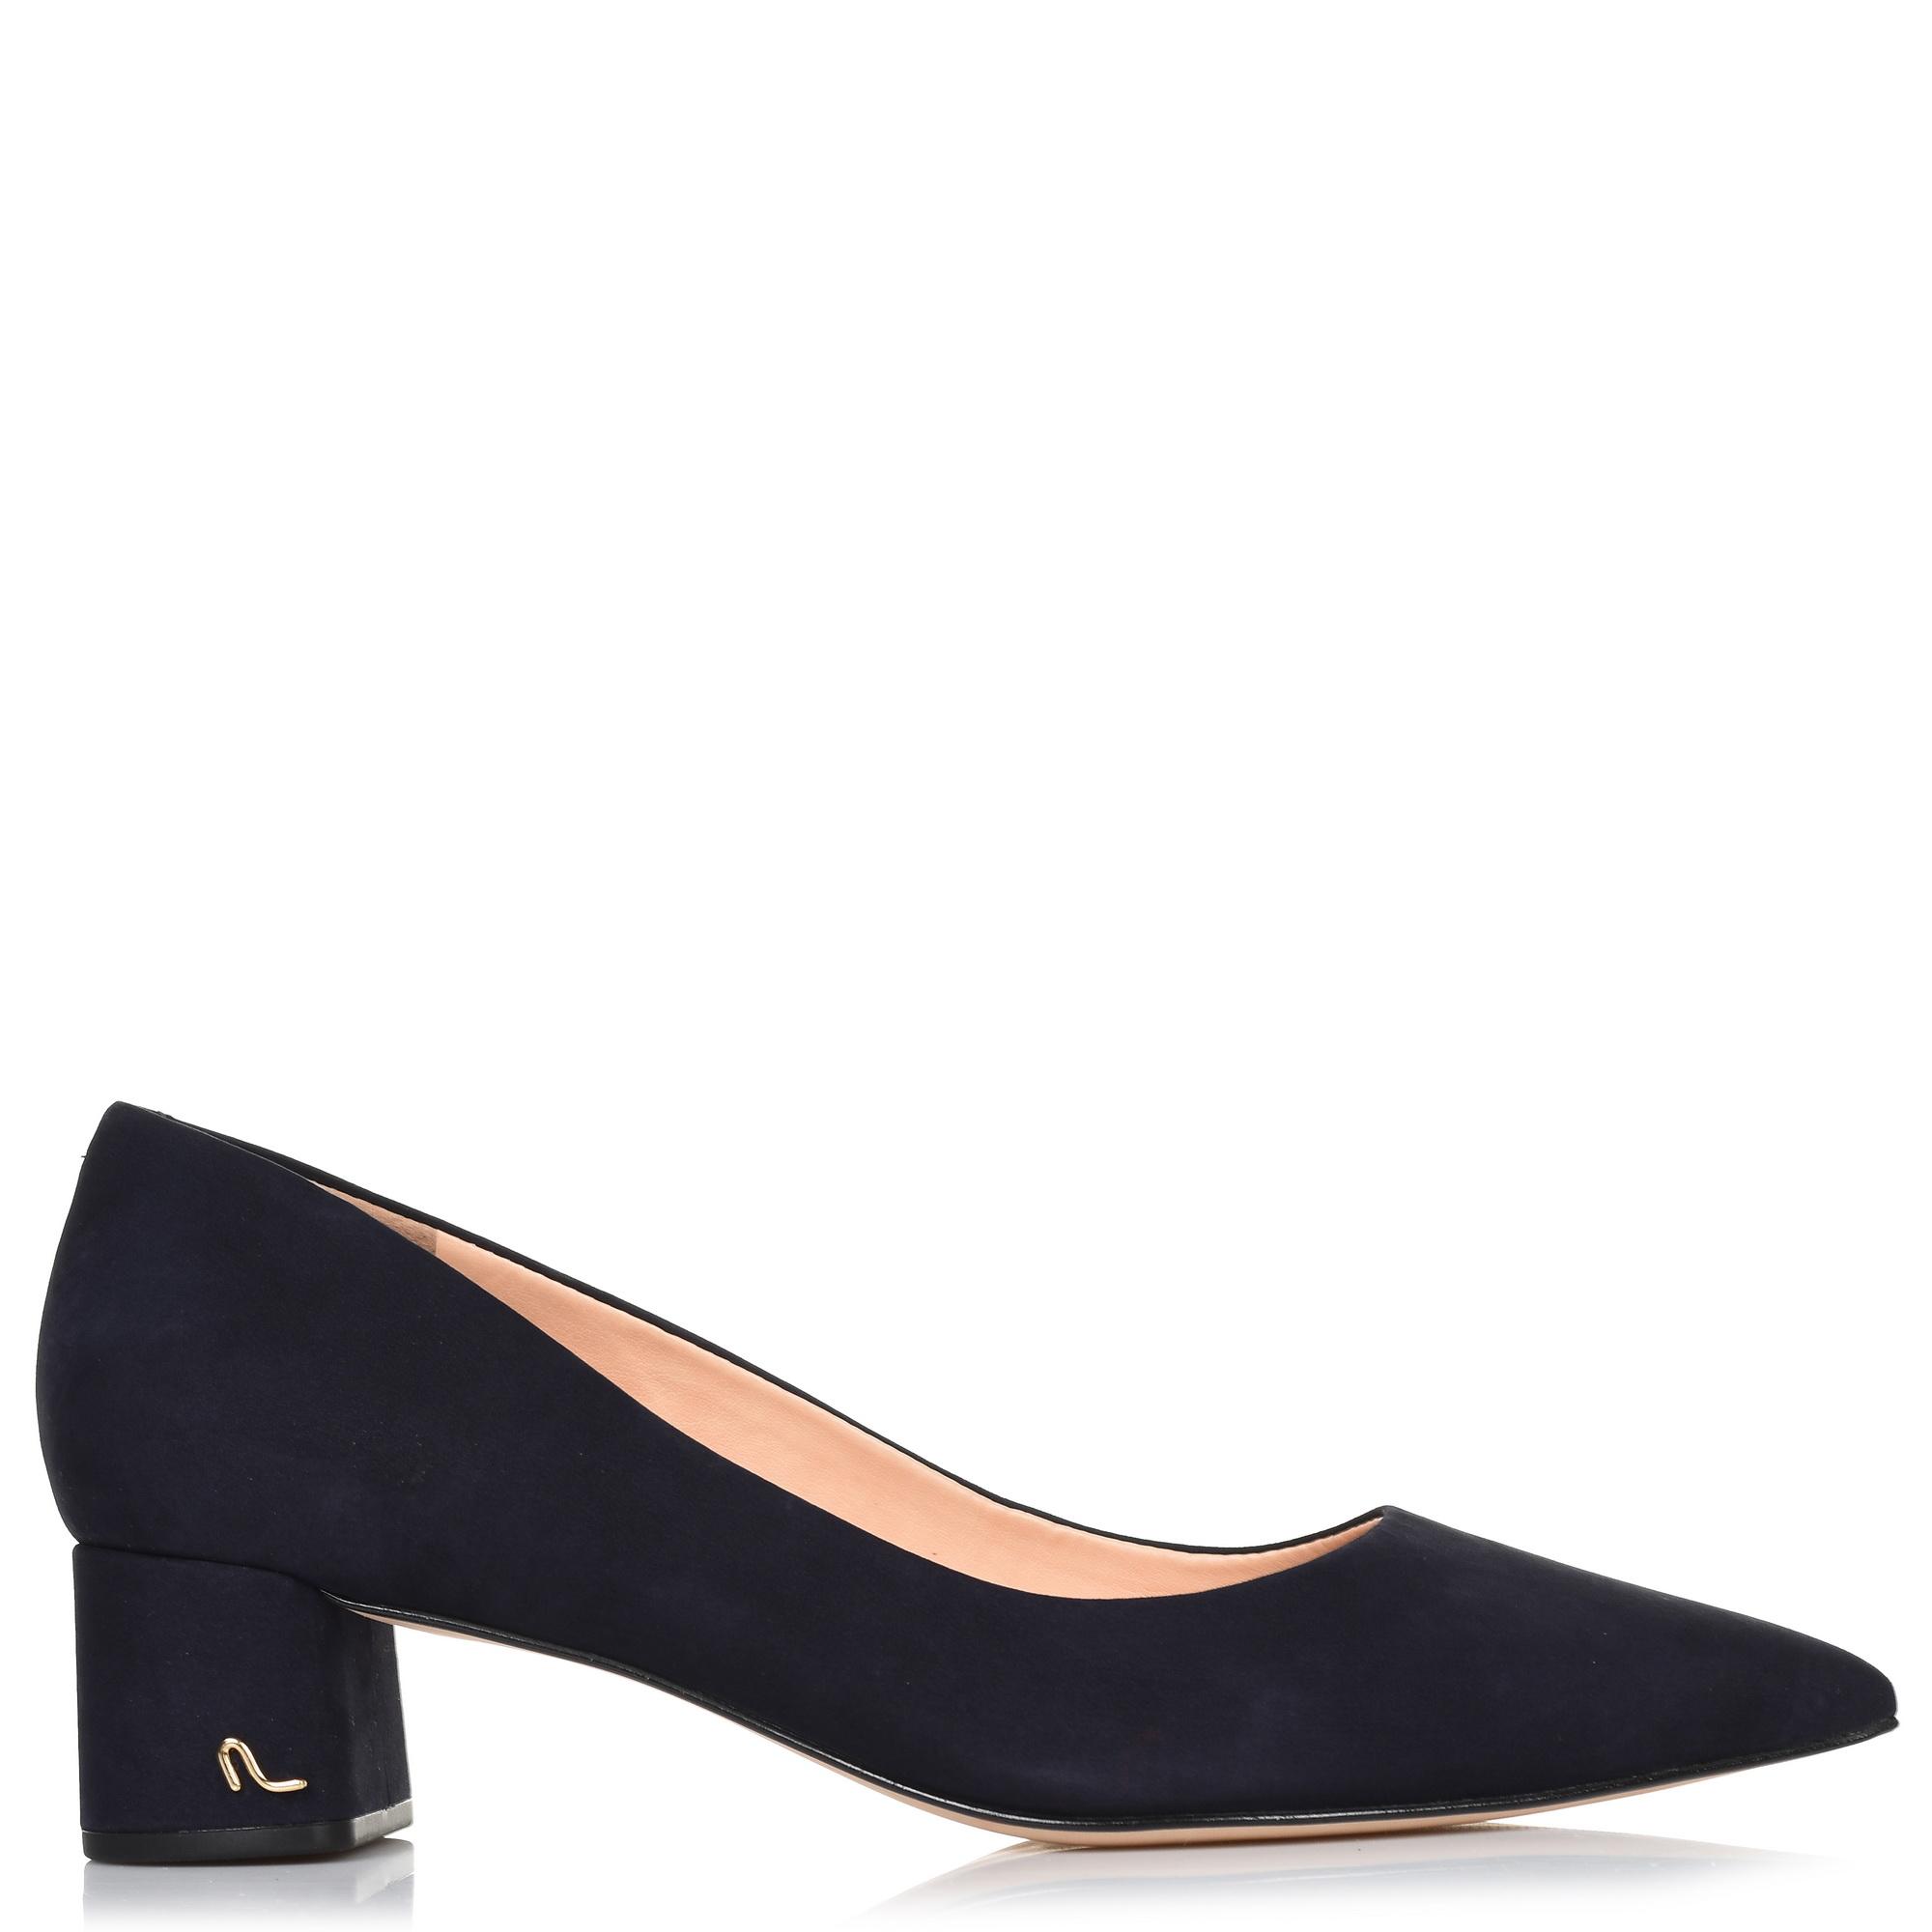 Suede Δερμάτινες Γόβες Carrano Cab2- Nobuck 135201E γυναικα   γυναικείο παπούτσι